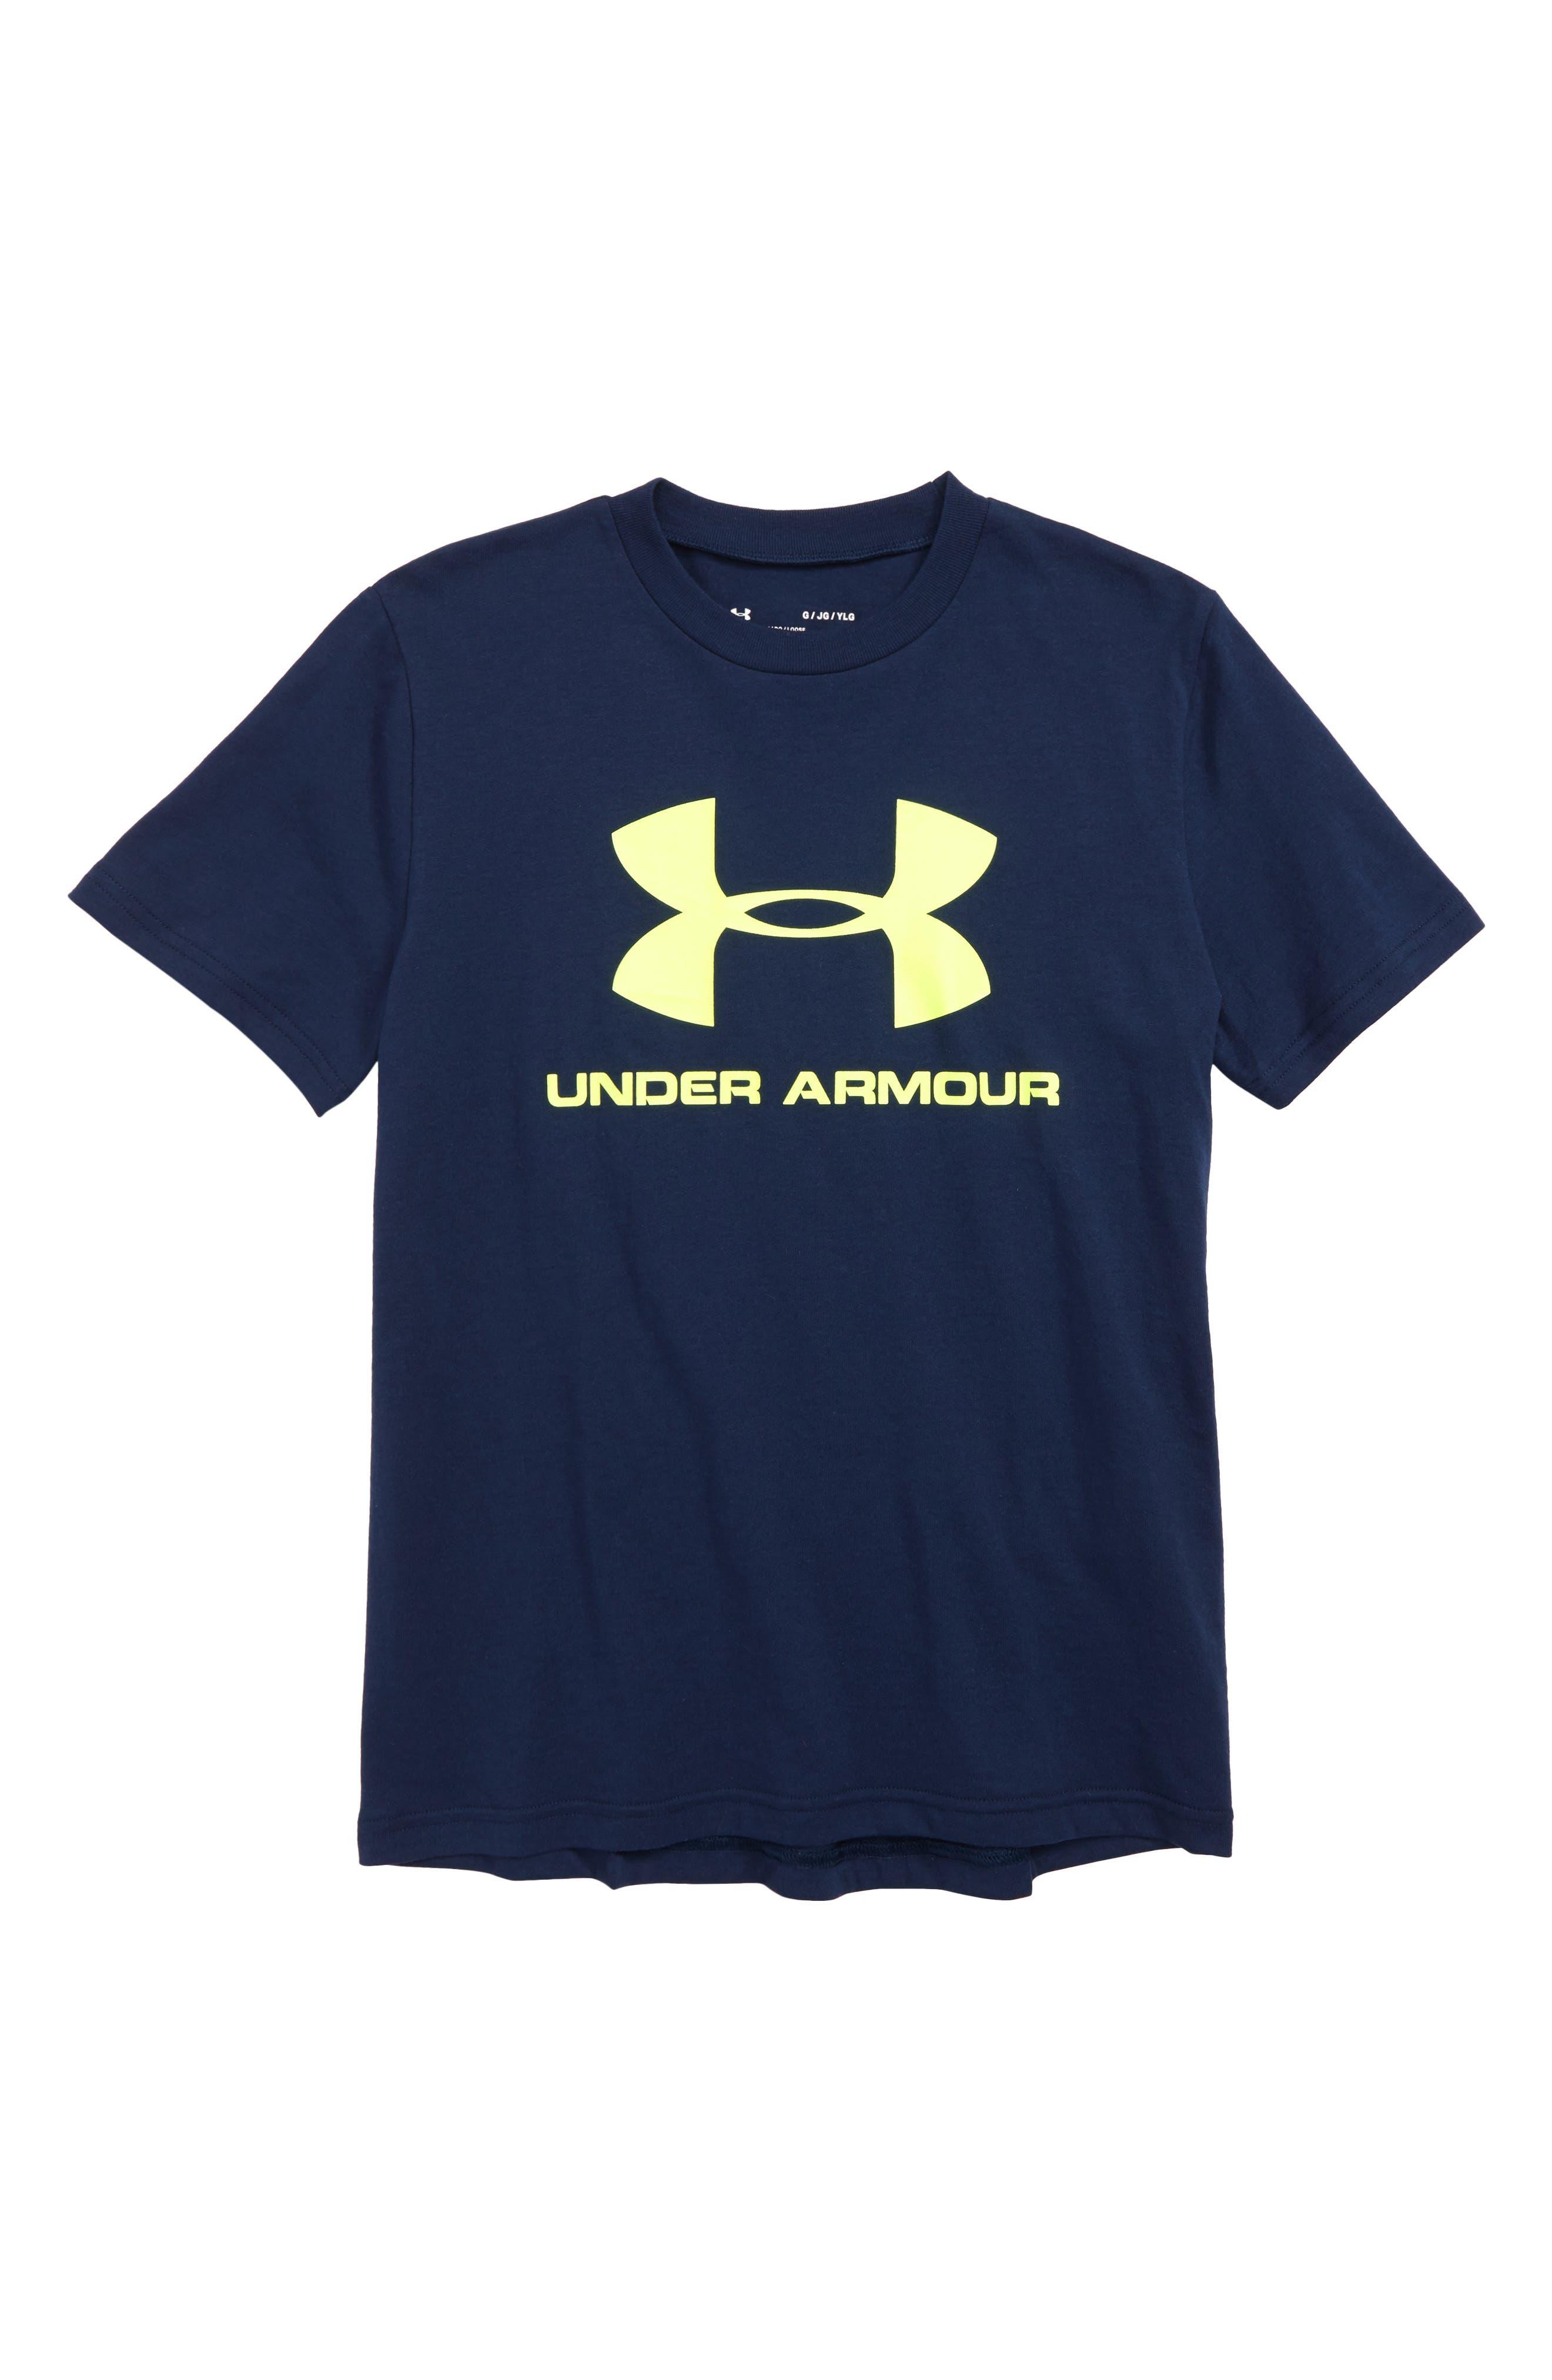 UNDER ARMOUR,                             Sportstyle Logo T-Shirt,                             Main thumbnail 1, color,                             408